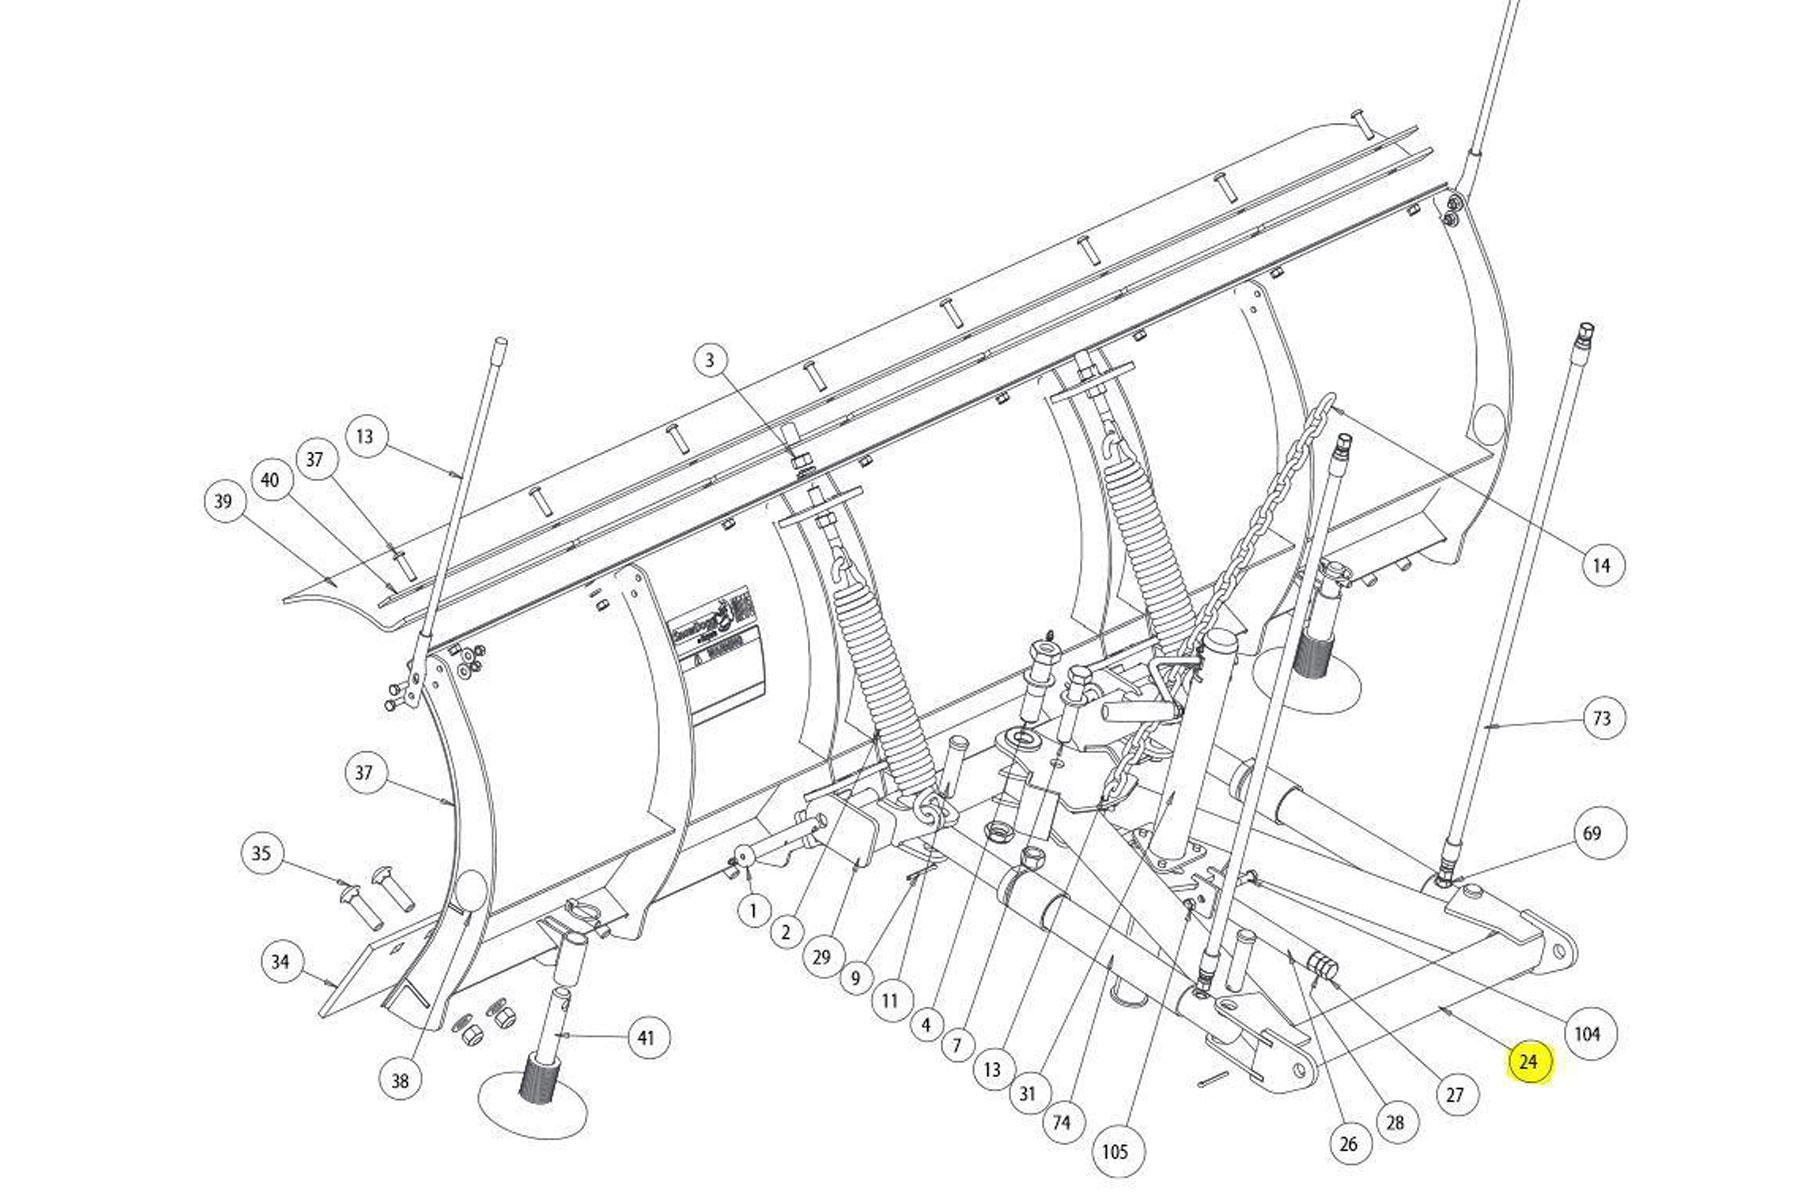 Snowdogg Wiring Harness Schematics Diagram Snapper Ex 80 Trusted Diagrams 7 Way Trailer Brake